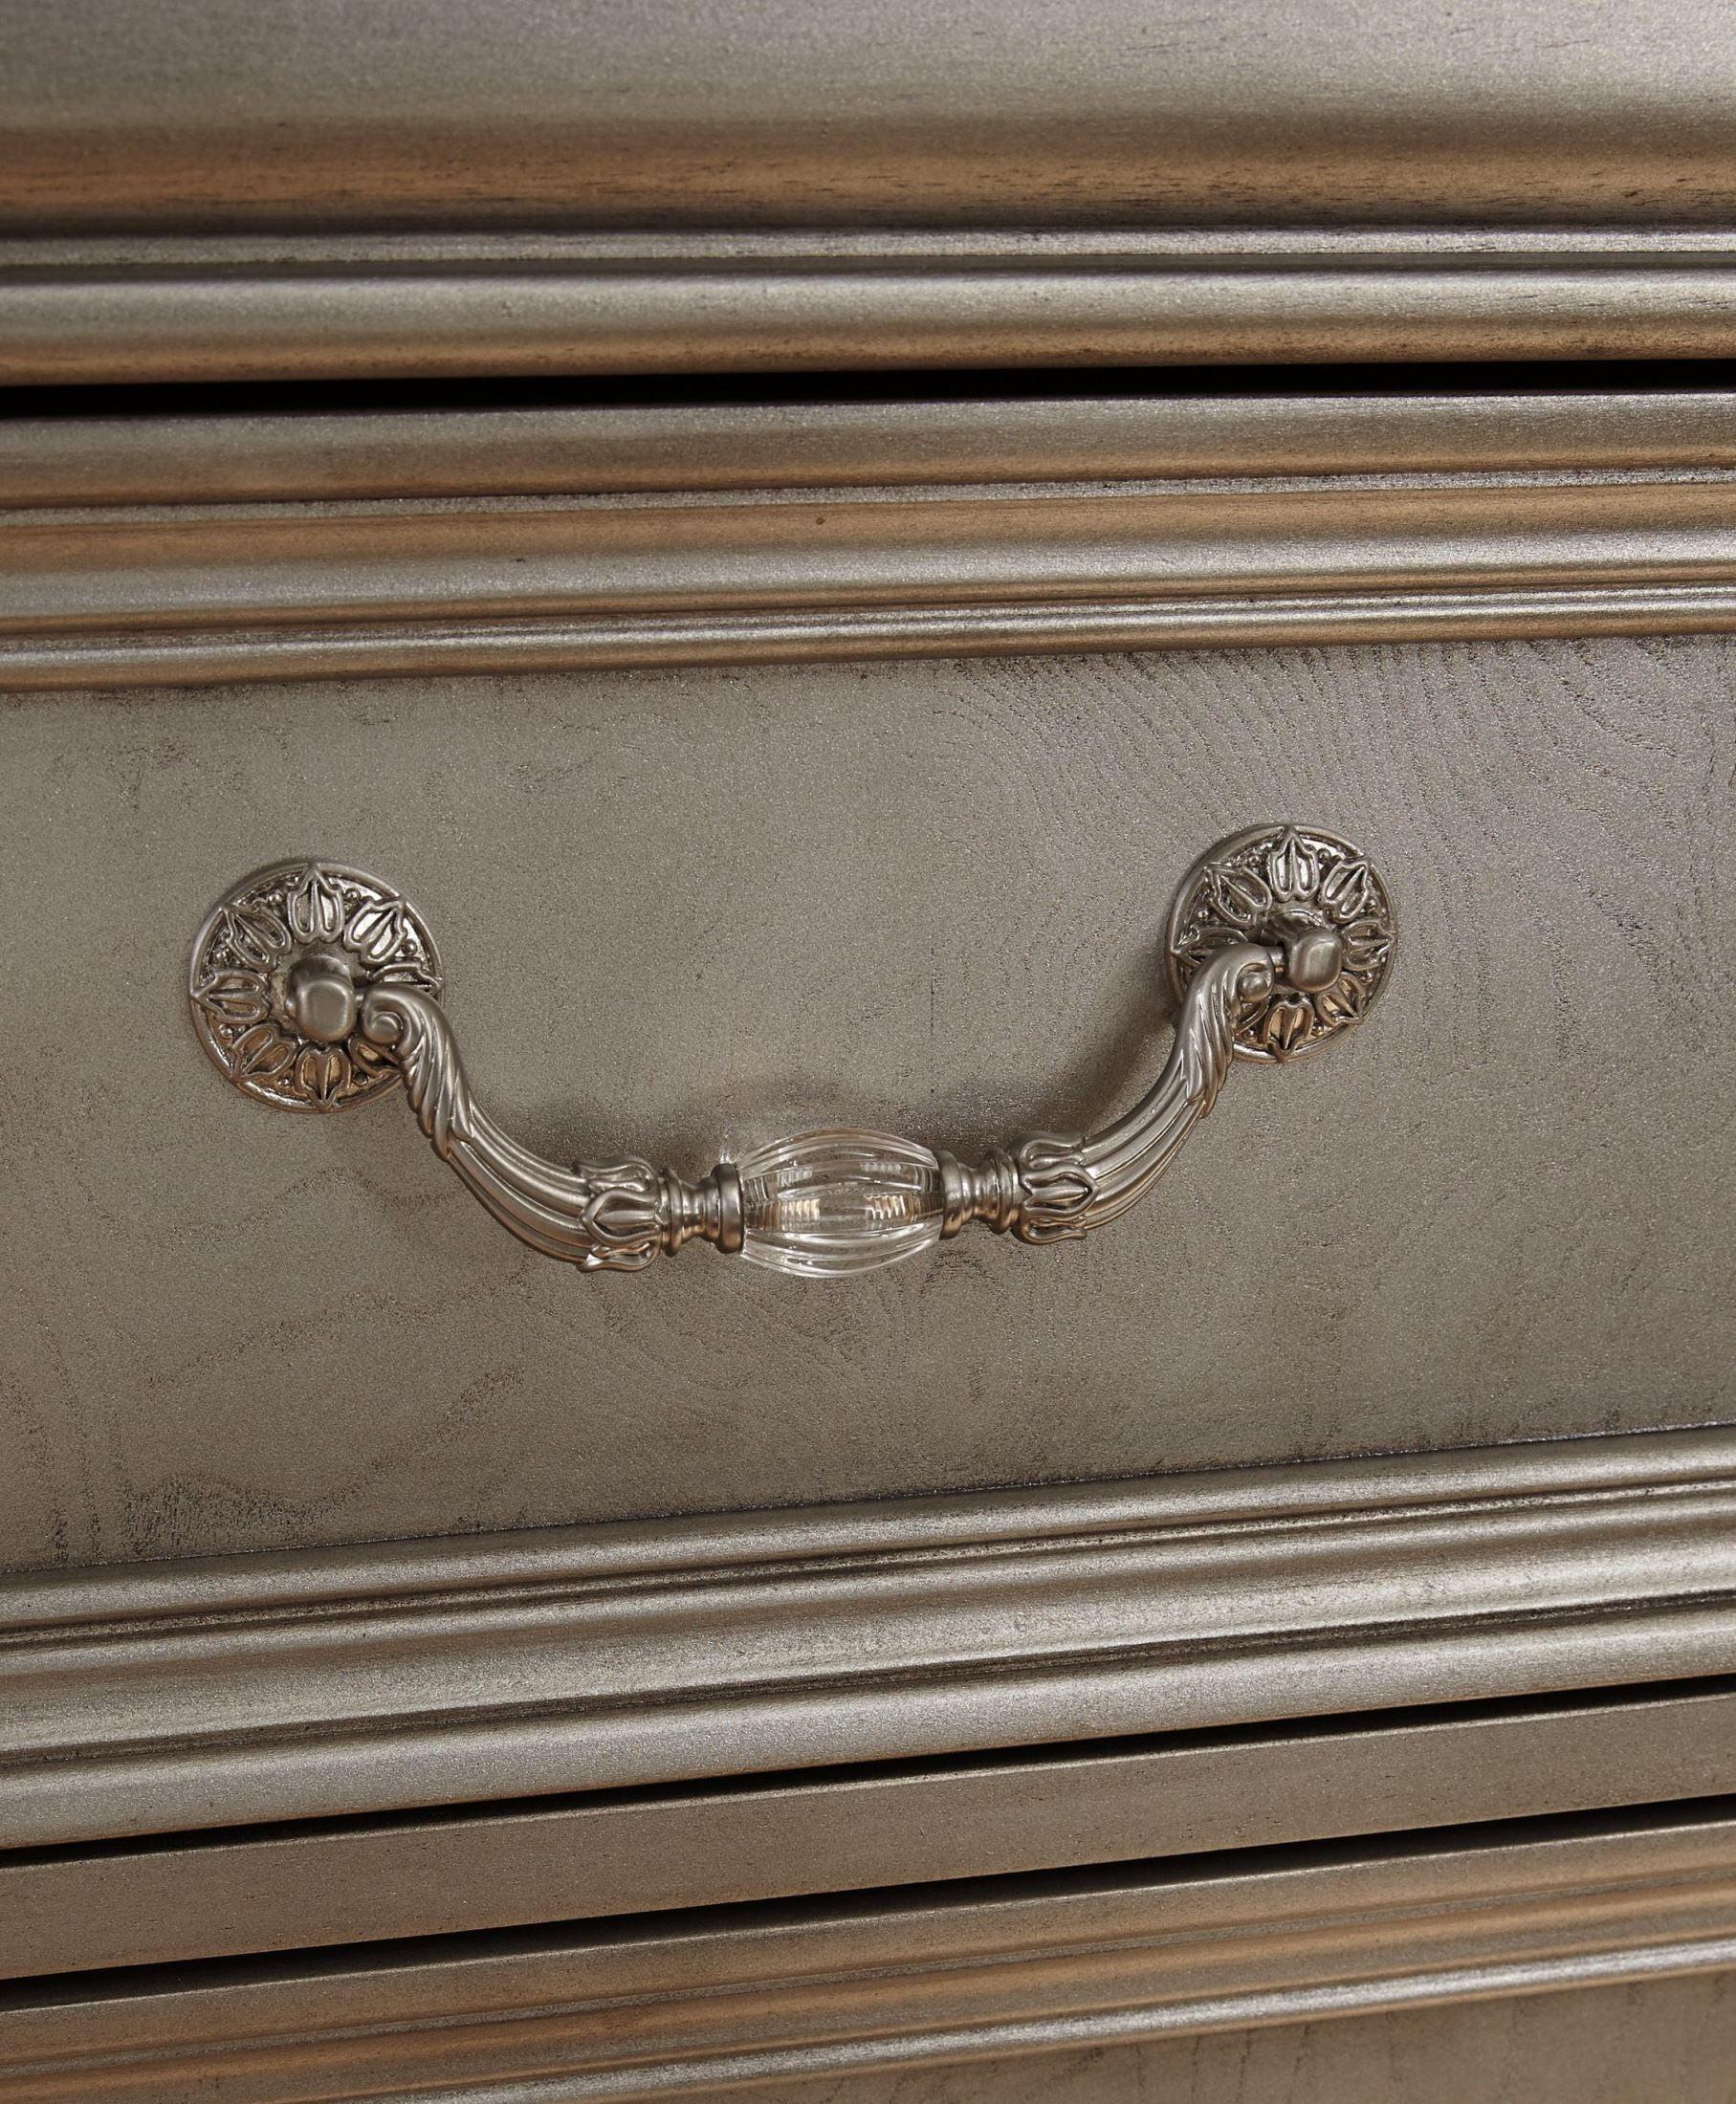 Birlanny Silver Upholstered Panel Bedroom Set B720 57 54: Birlanny Silver Upholstered 4 Piece Panel Bedroom Set